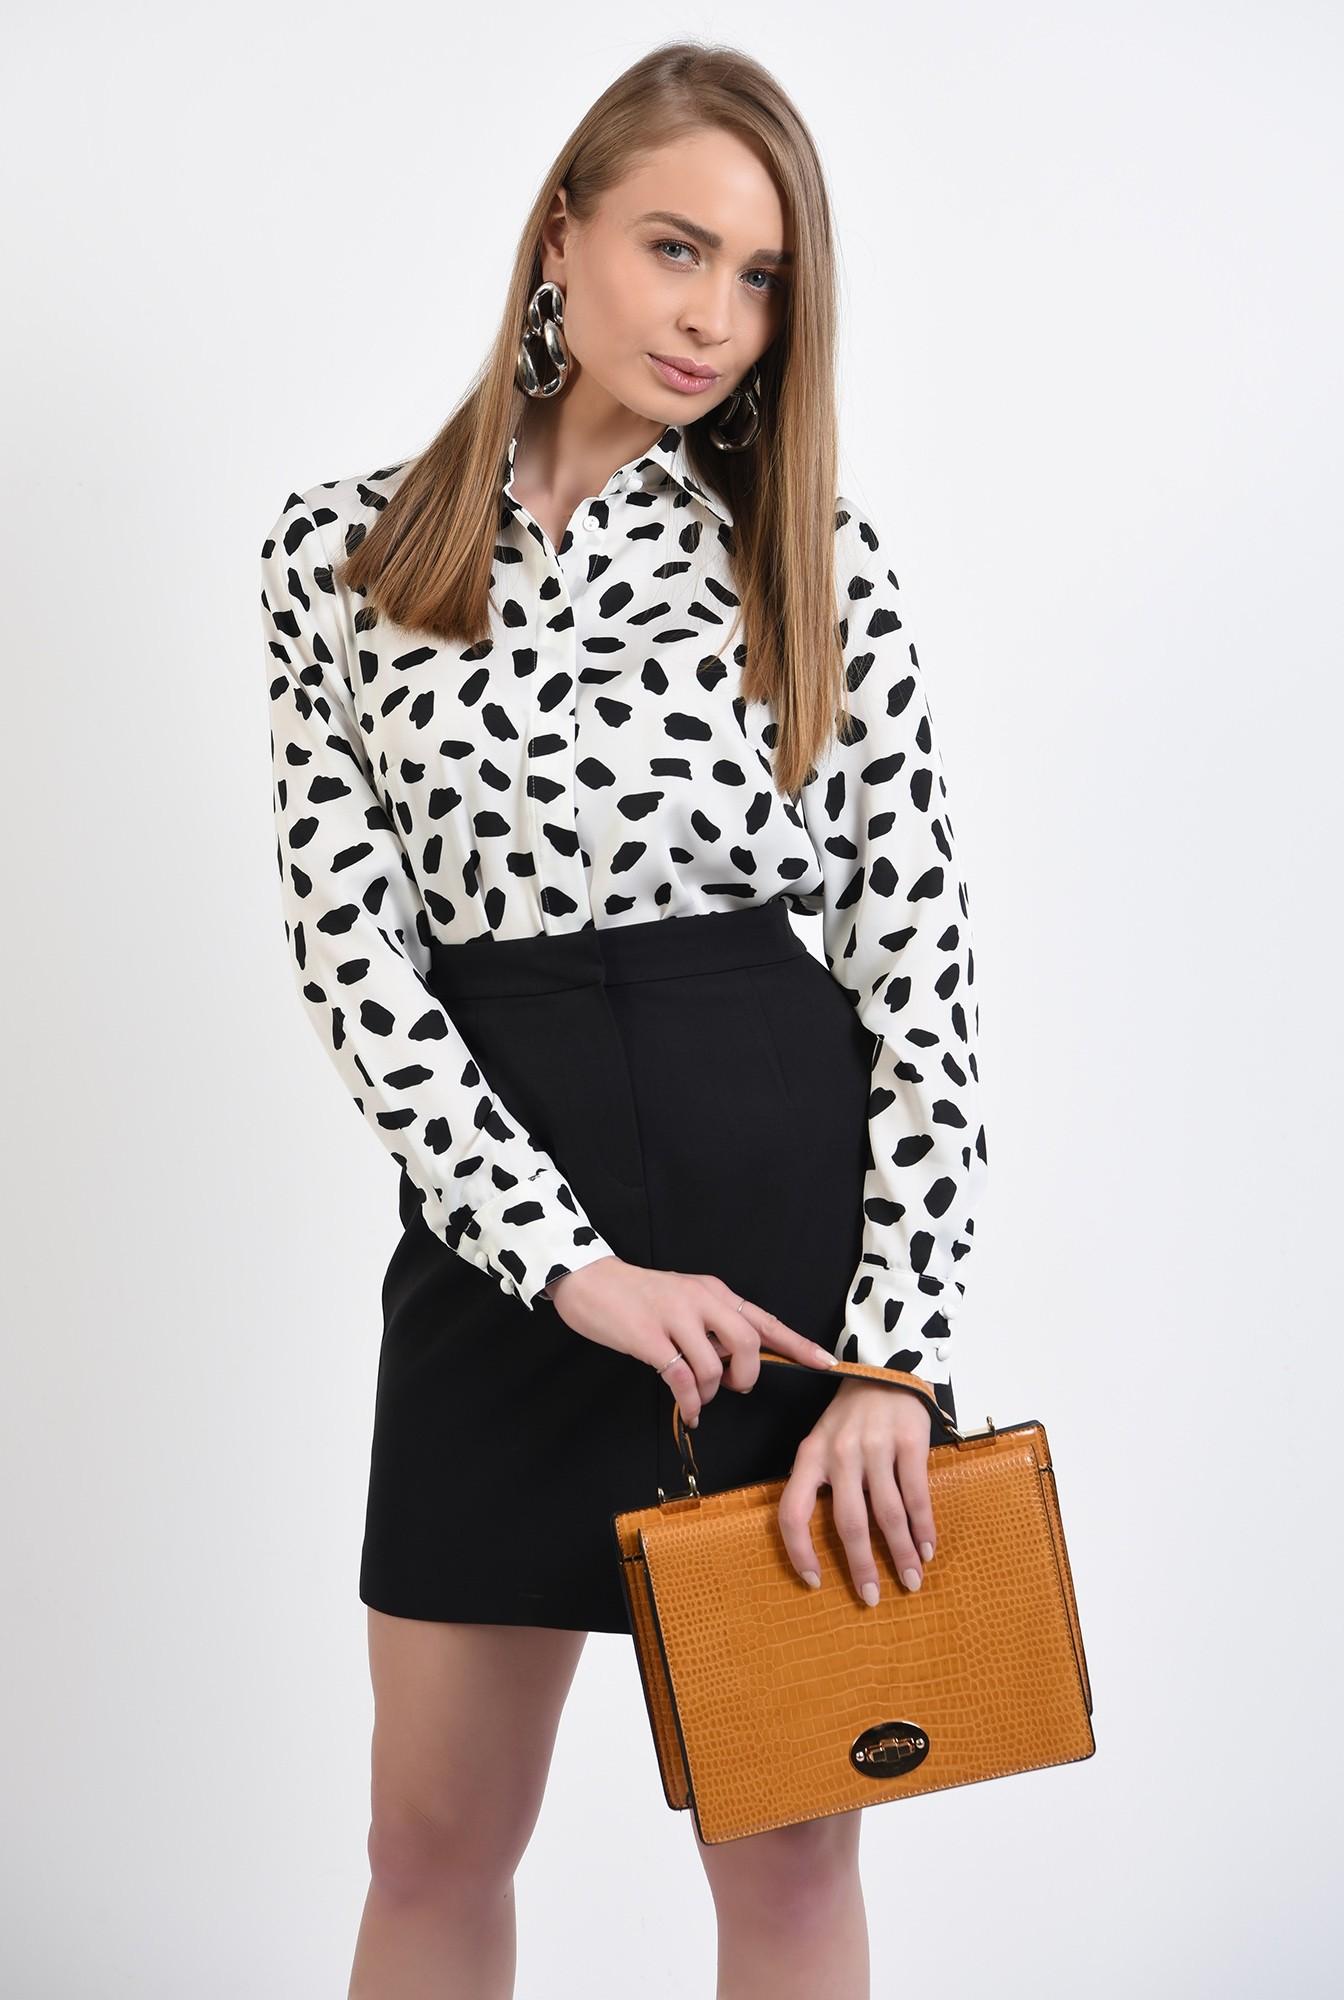 0 -  camasa cu imprimeu, din satin, alb-negru, camasa de primavara